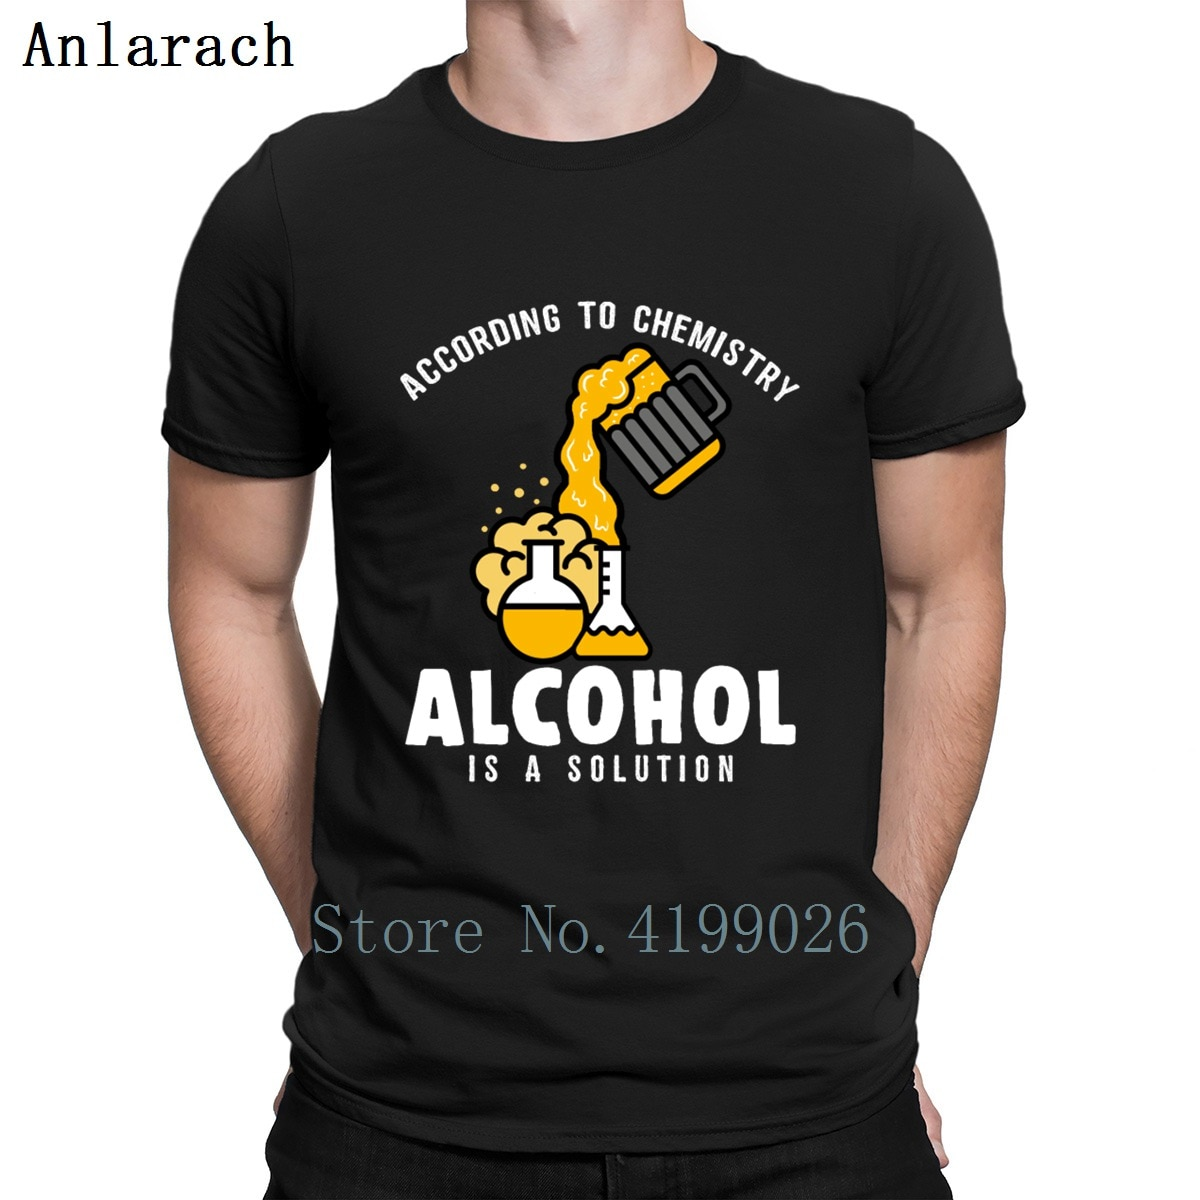 Divertida camiseta de tetera de química con Alcohol, camiseta de manga corta, gran creativa, camiseta de Hip Hop, oferta barata, camiseta de Hip Hop